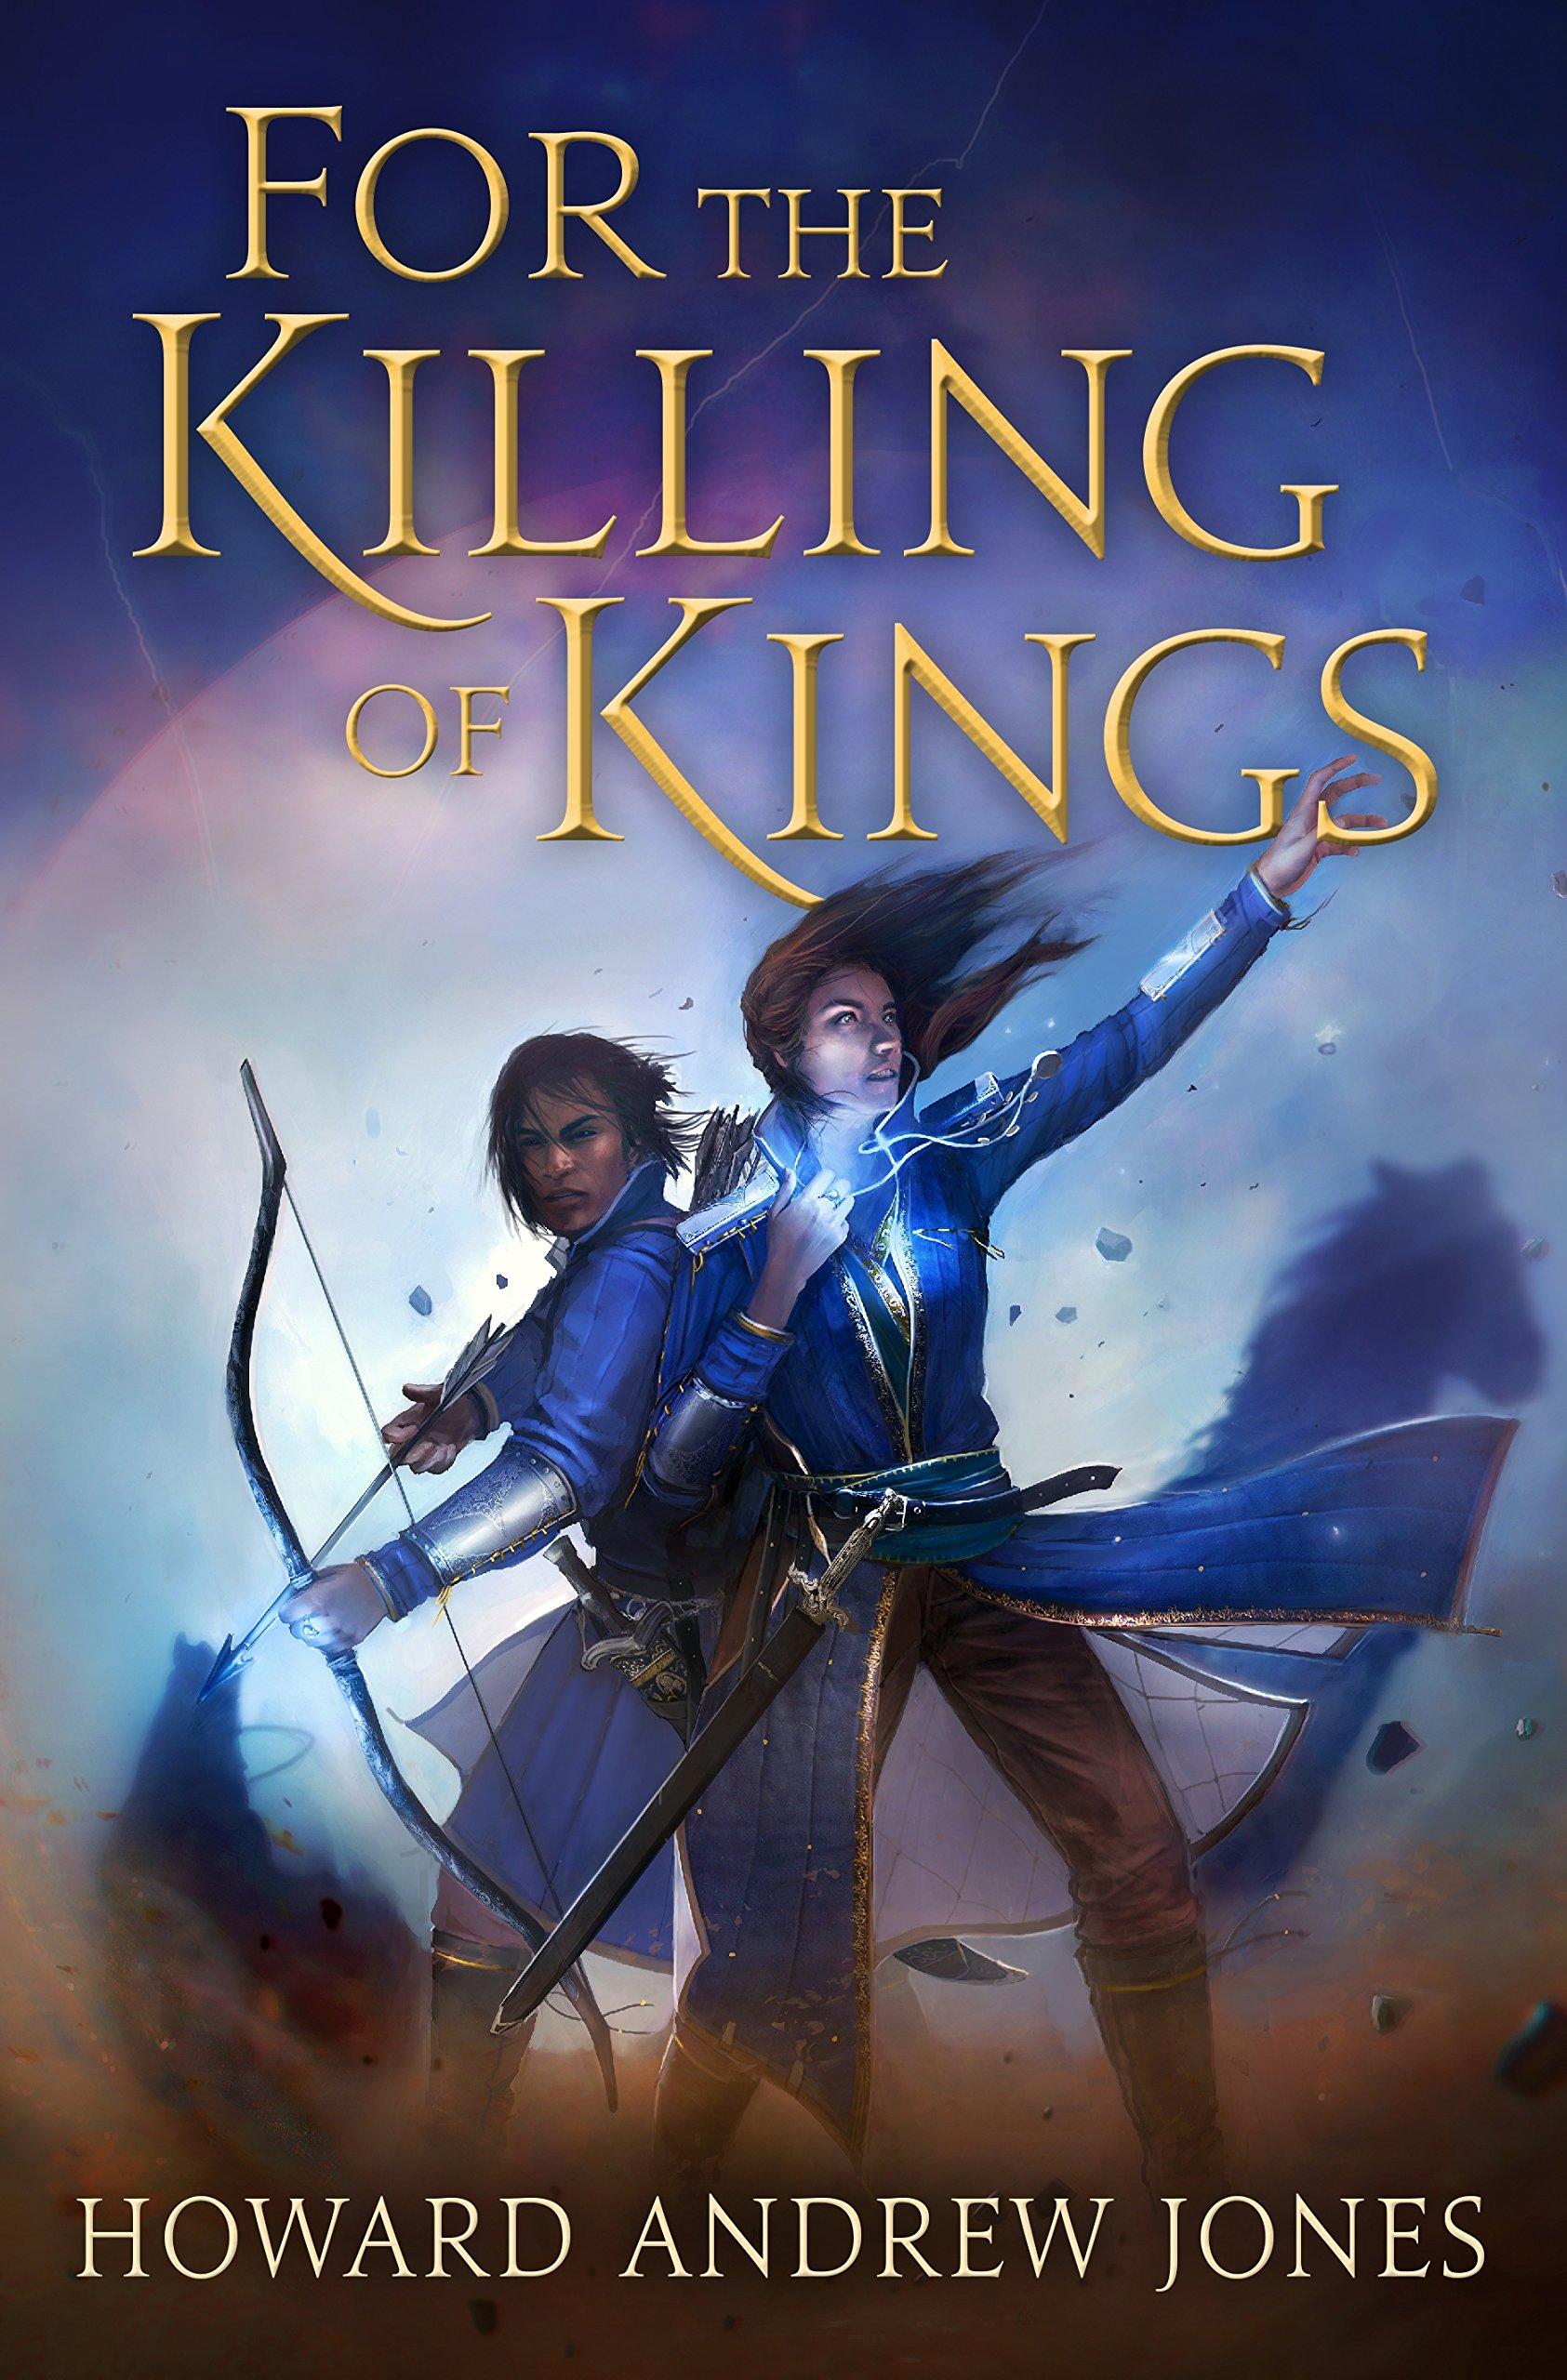 For the Killing of Kings (The Ring-Sworn Trilogy): Howard Andrew